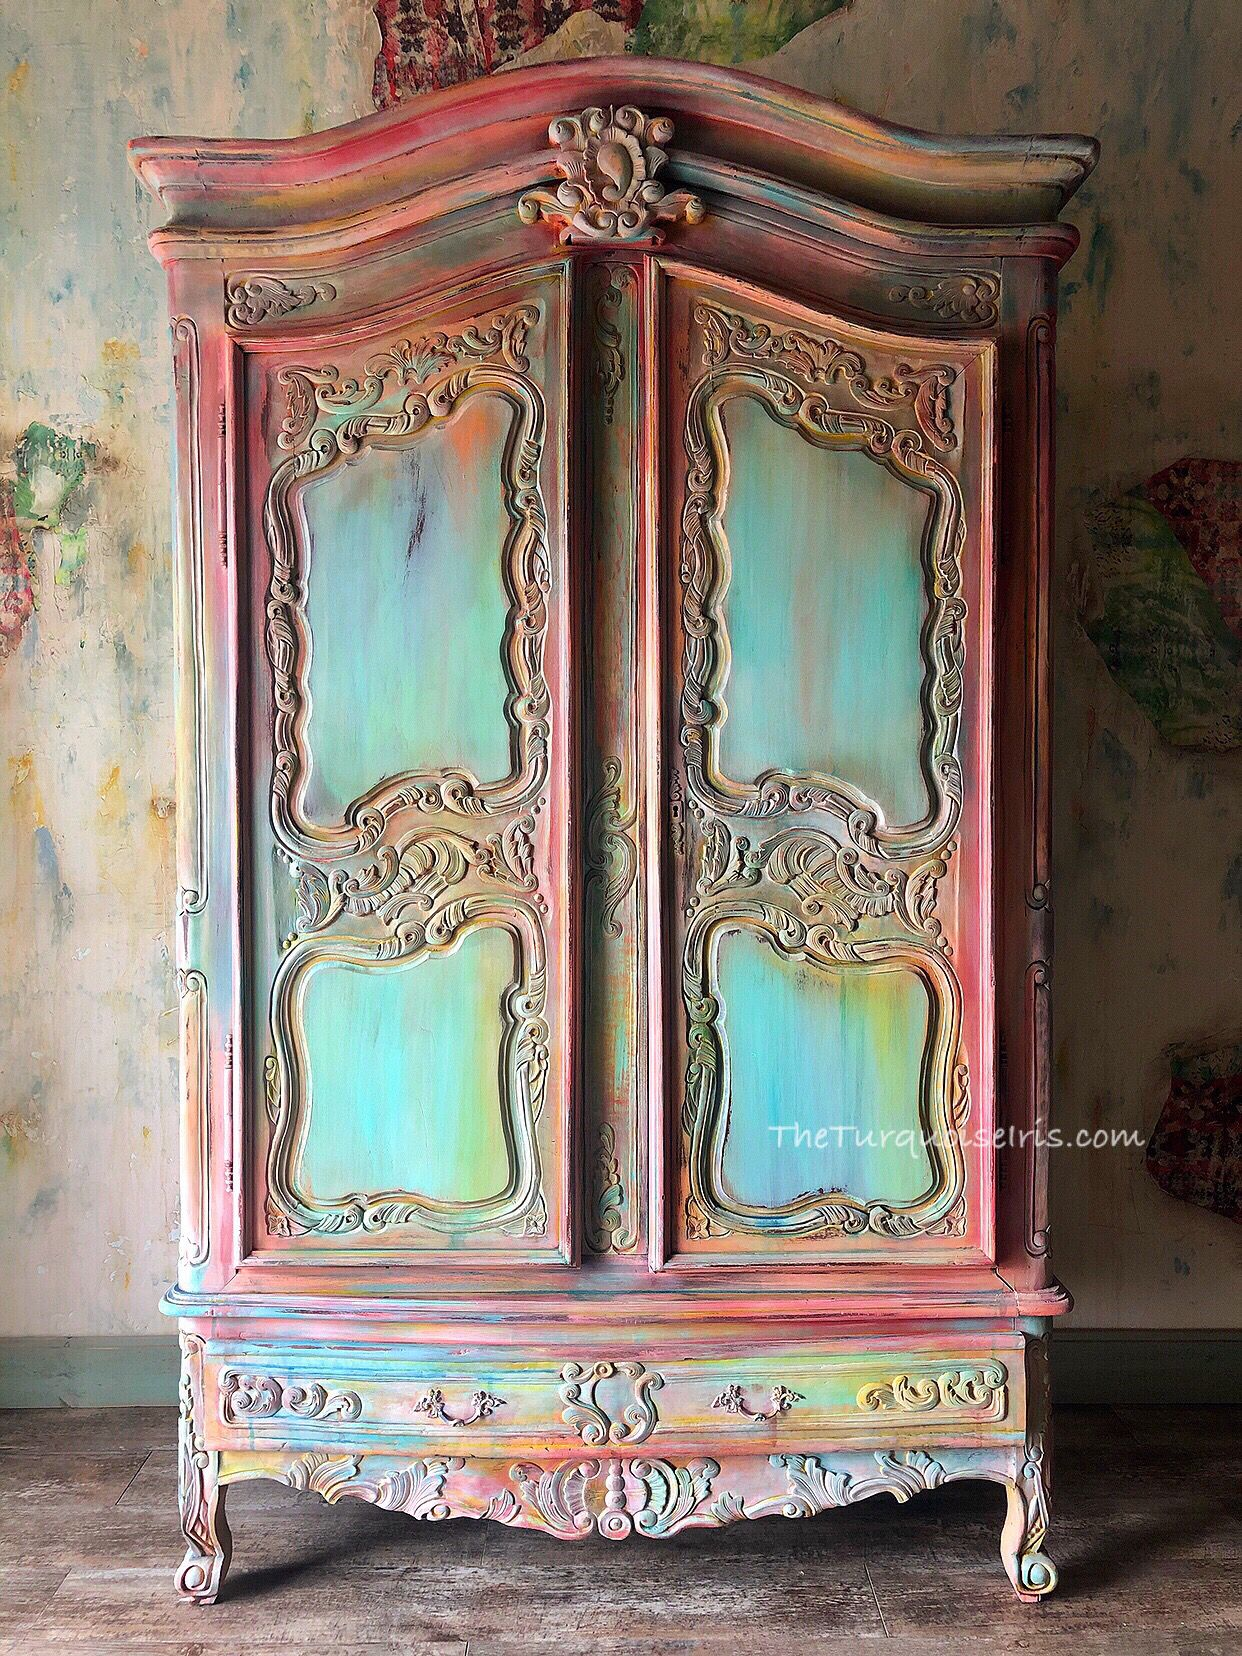 #furniturepainter #furnitureartist #vintagefurniture #paintedfurniture #loveart #oklahomaartist #okcartist #oneofakind #theturquoiseiris #handpainted #claybasedpaint #createallday #creativeentreprenuer #dotheDionne #colormovement #DIYpaint #debisdesigndiary #makersgonnamake  #makingit #SoDomino #bohoblue #bohostyle #bohodesign #redesign #chalkpaint #businesscoach #creativebusiness #creativecoaching #onlineclass